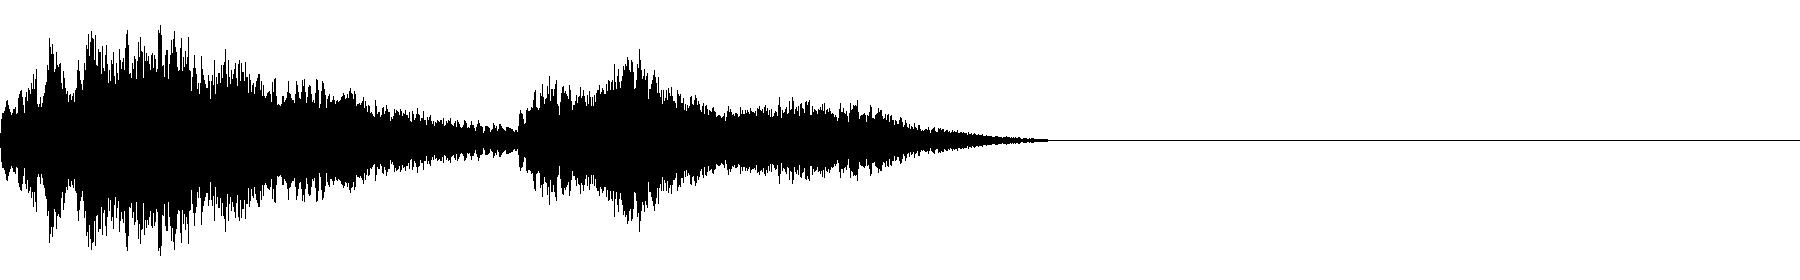 Crackling Fire Sound Fx Sample Focus